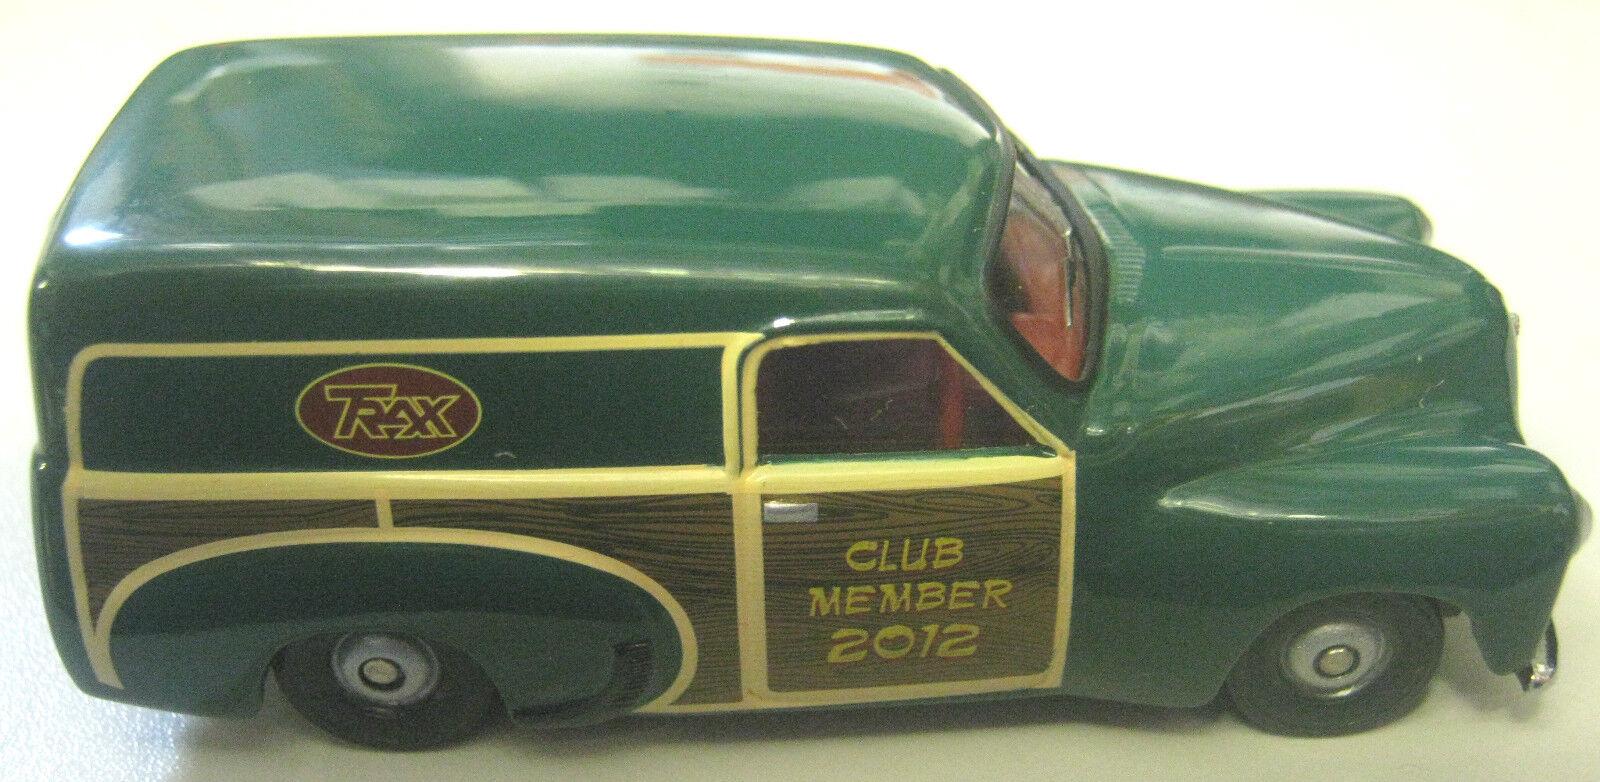 Trax 1 64 2012 Holden FJ Club car in bag..